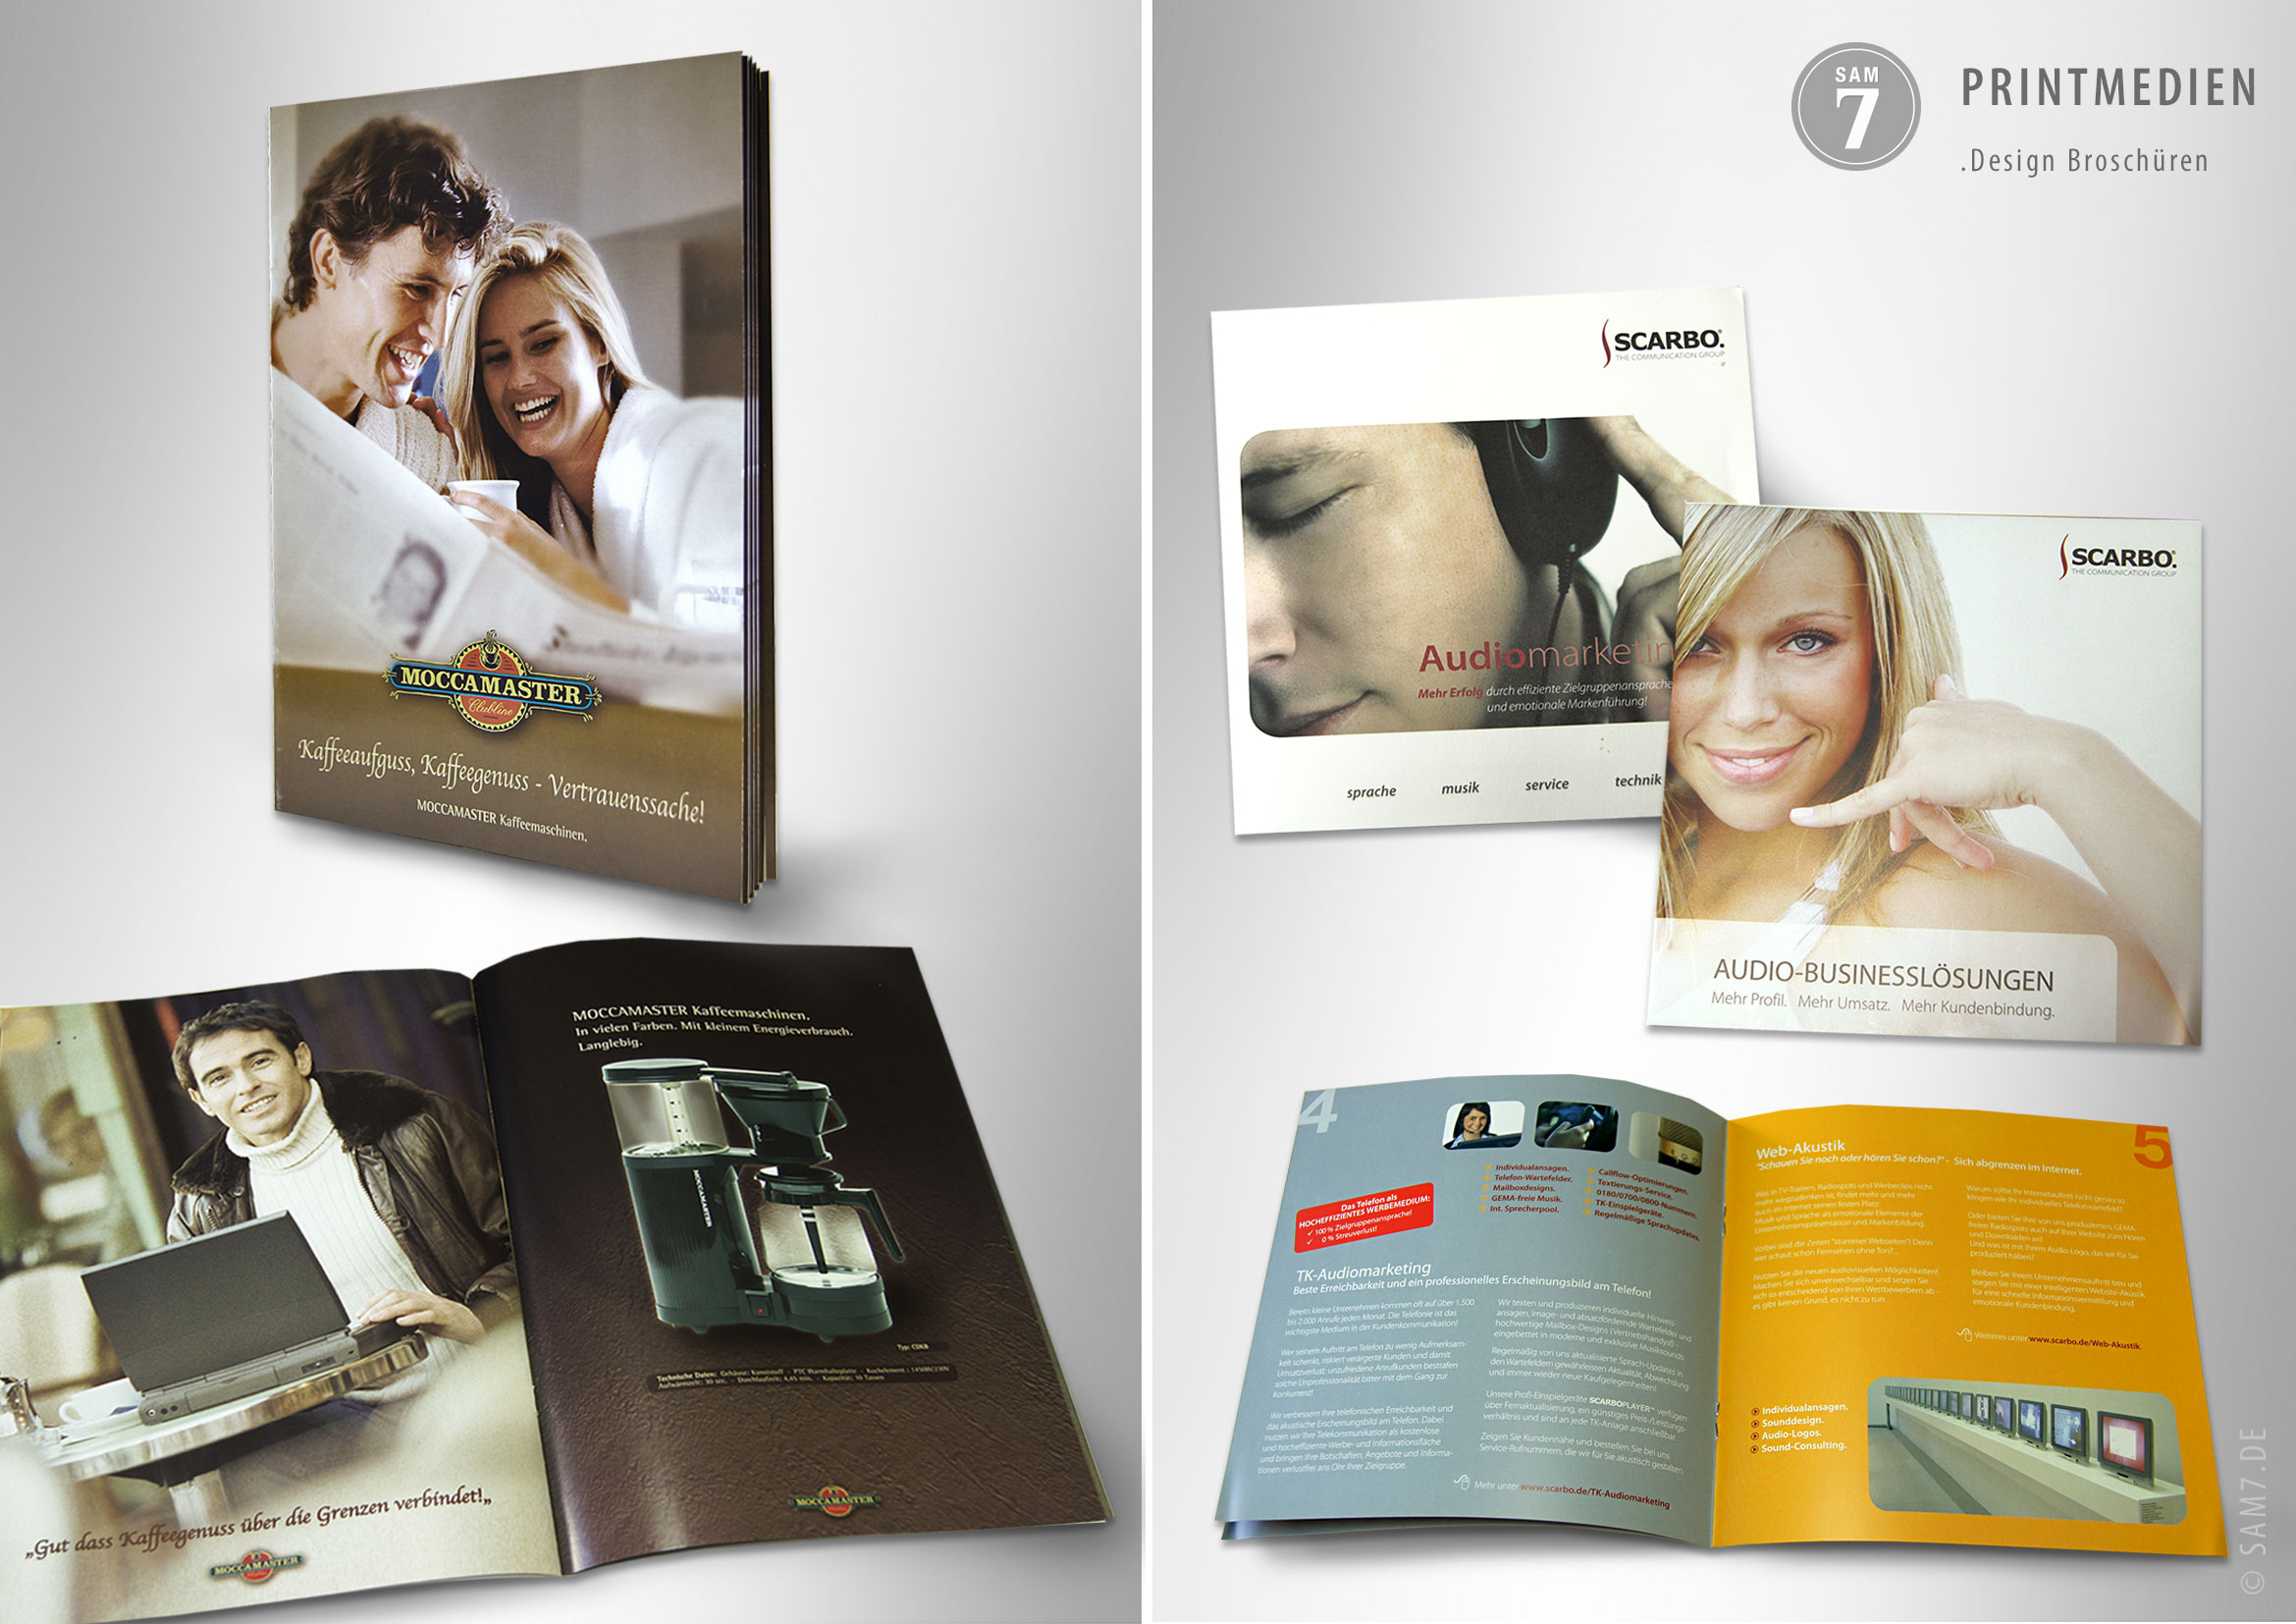 Design Broschueren. Print Media.